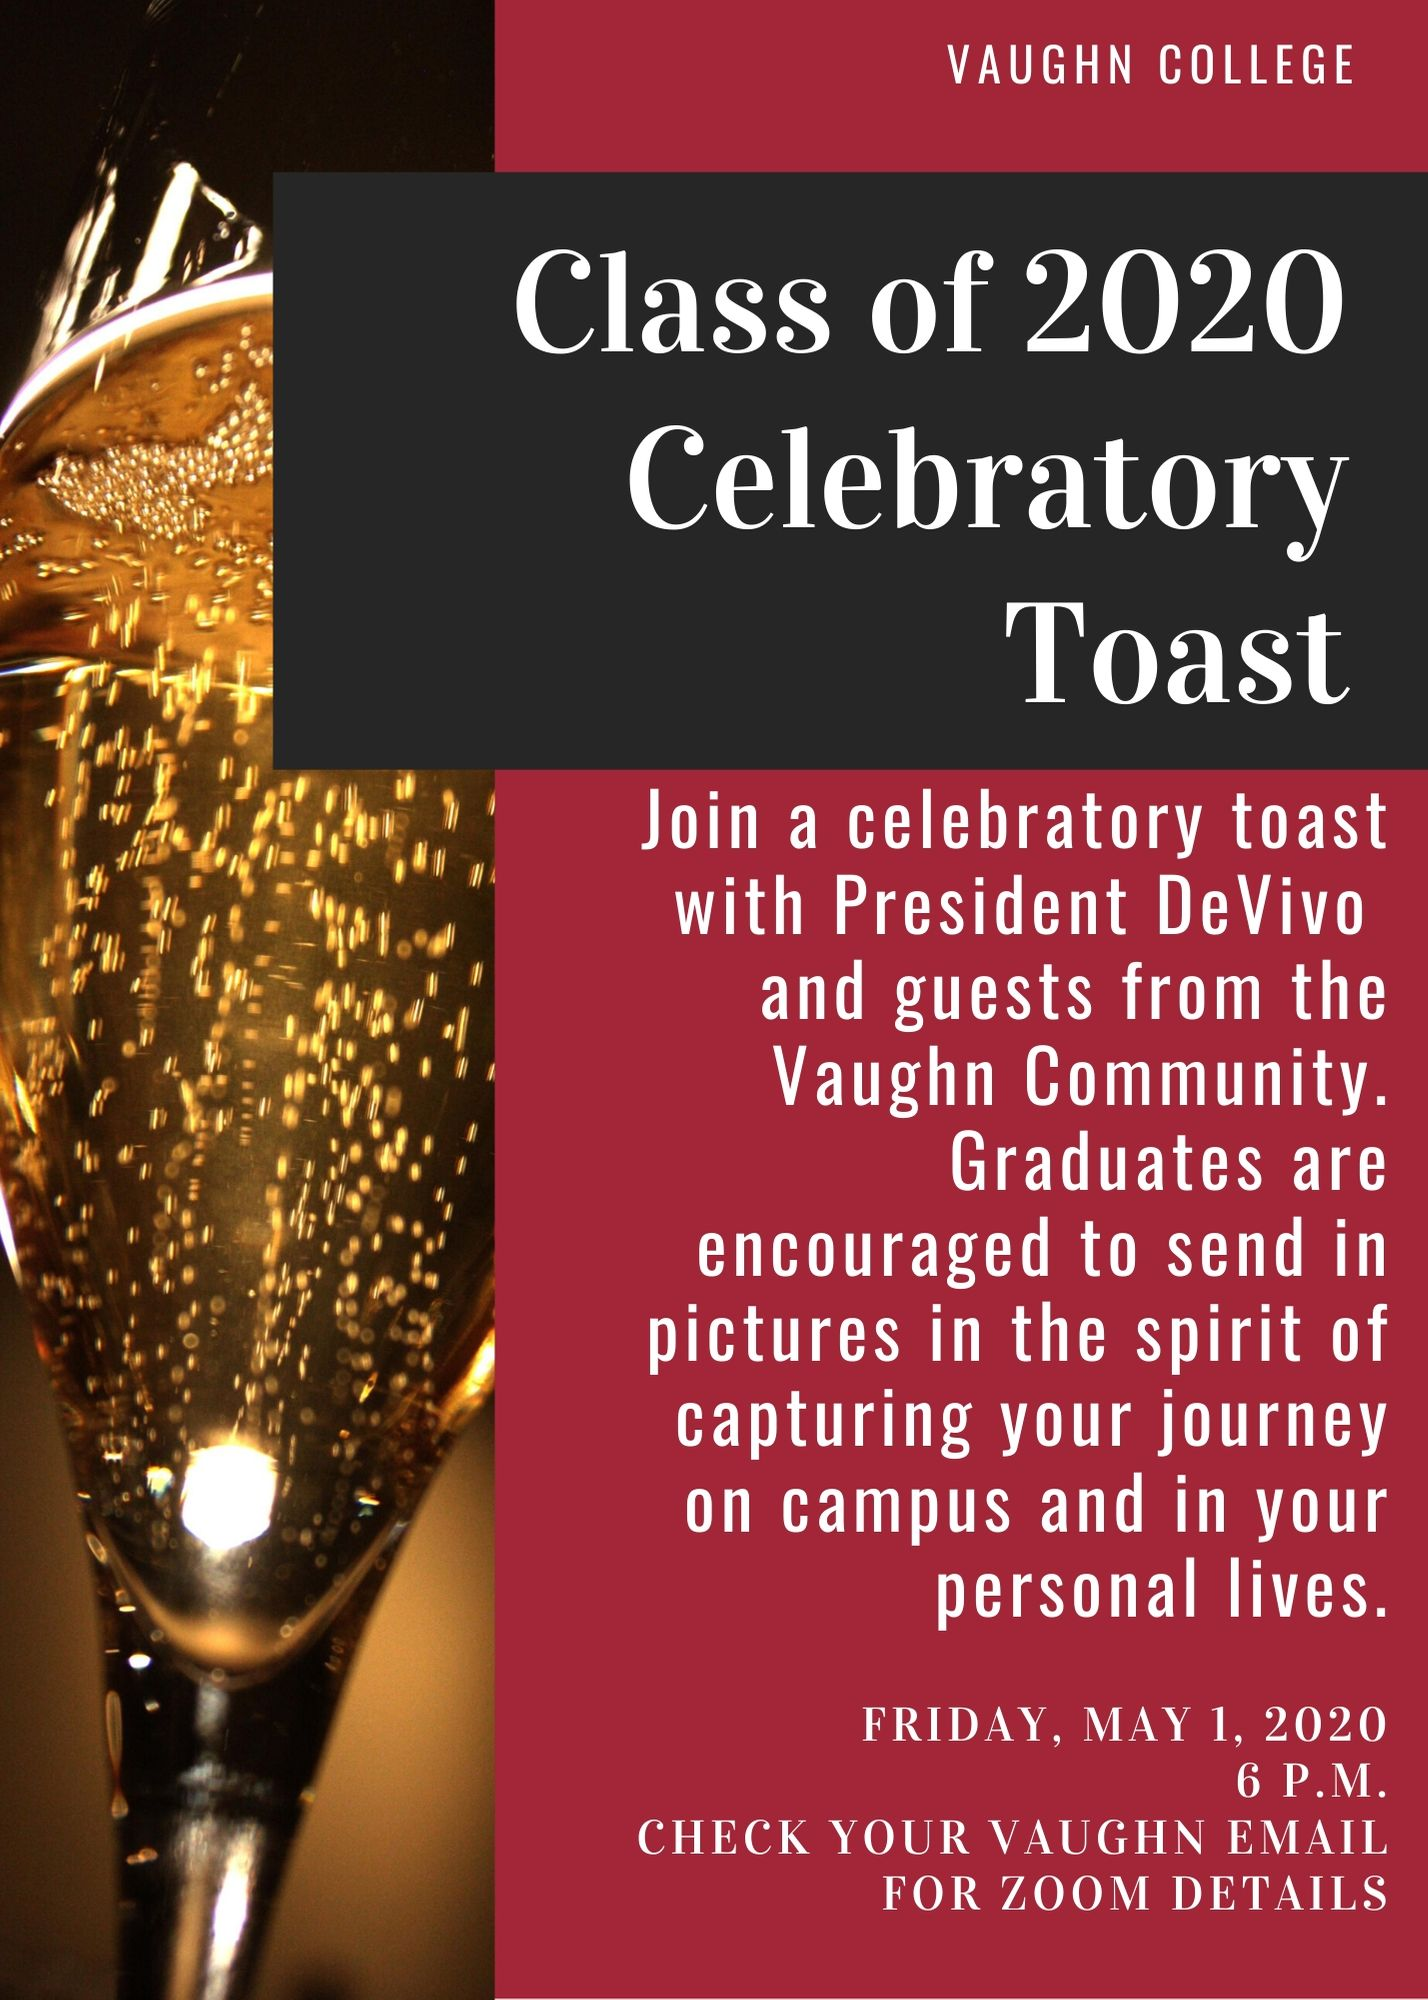 Vaughn Virtually Toasts the Class of 2020